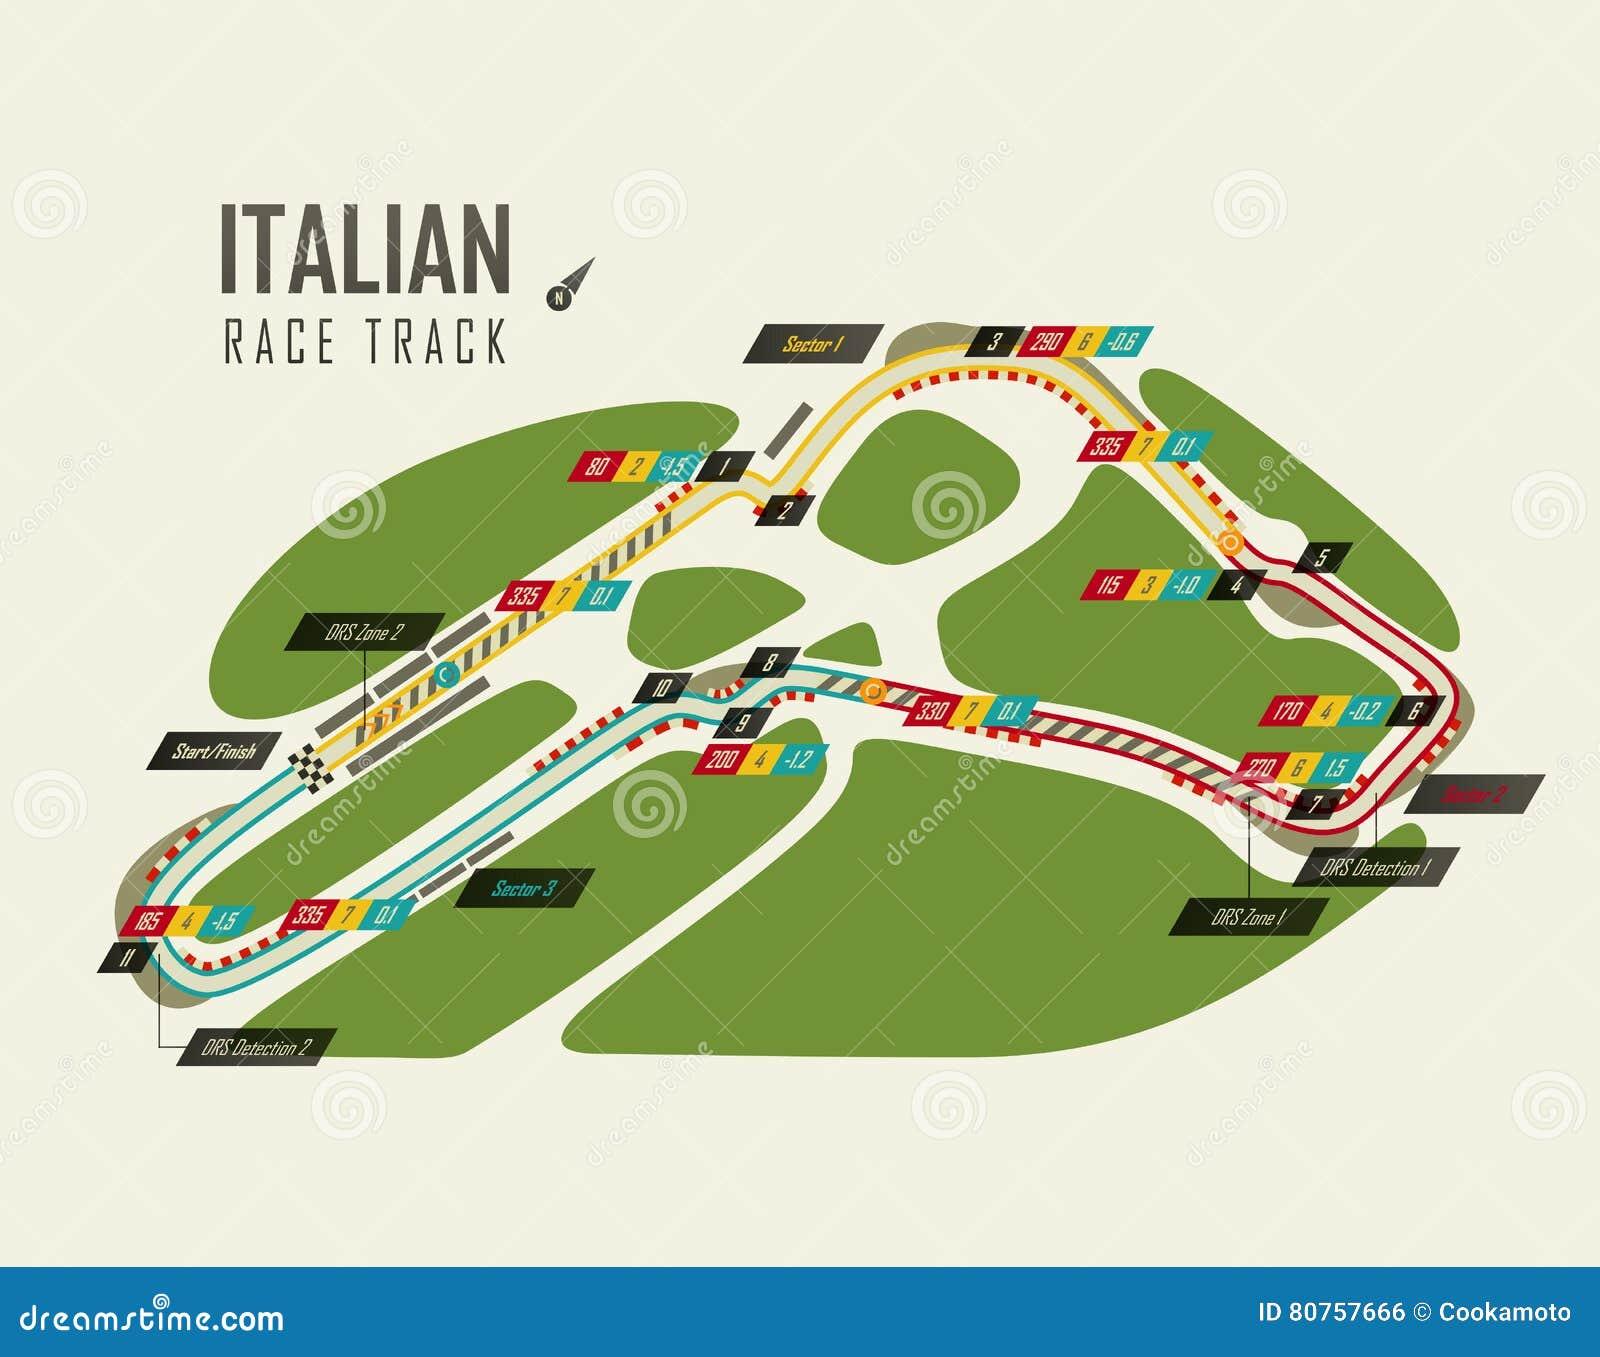 Monza Cartoons, Illustrations & Vector Stock Images